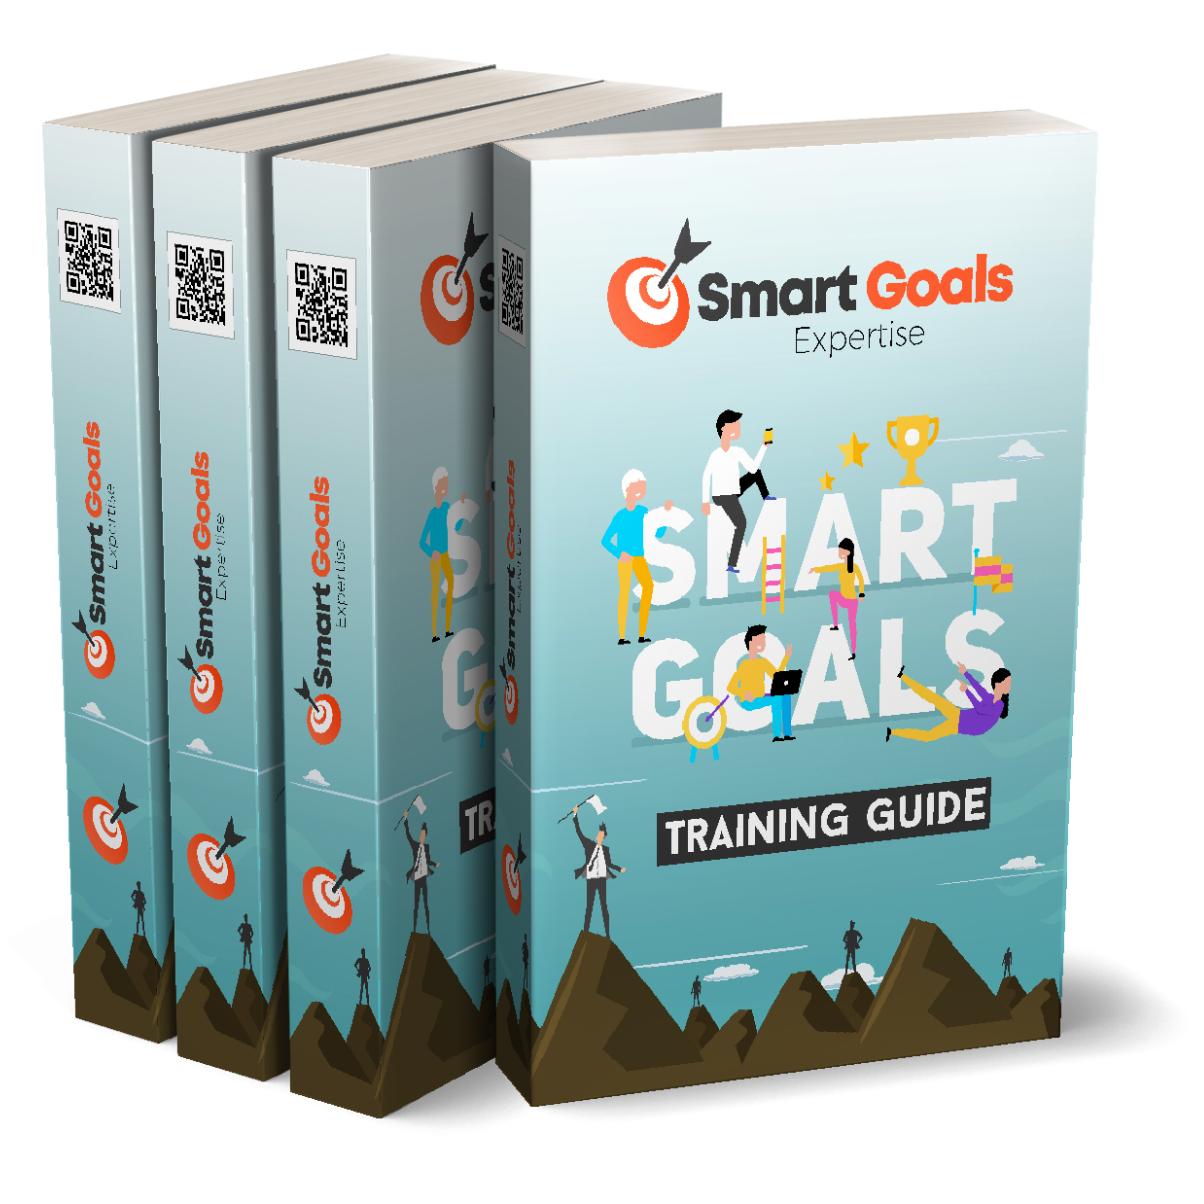 Smart Goals Expretise